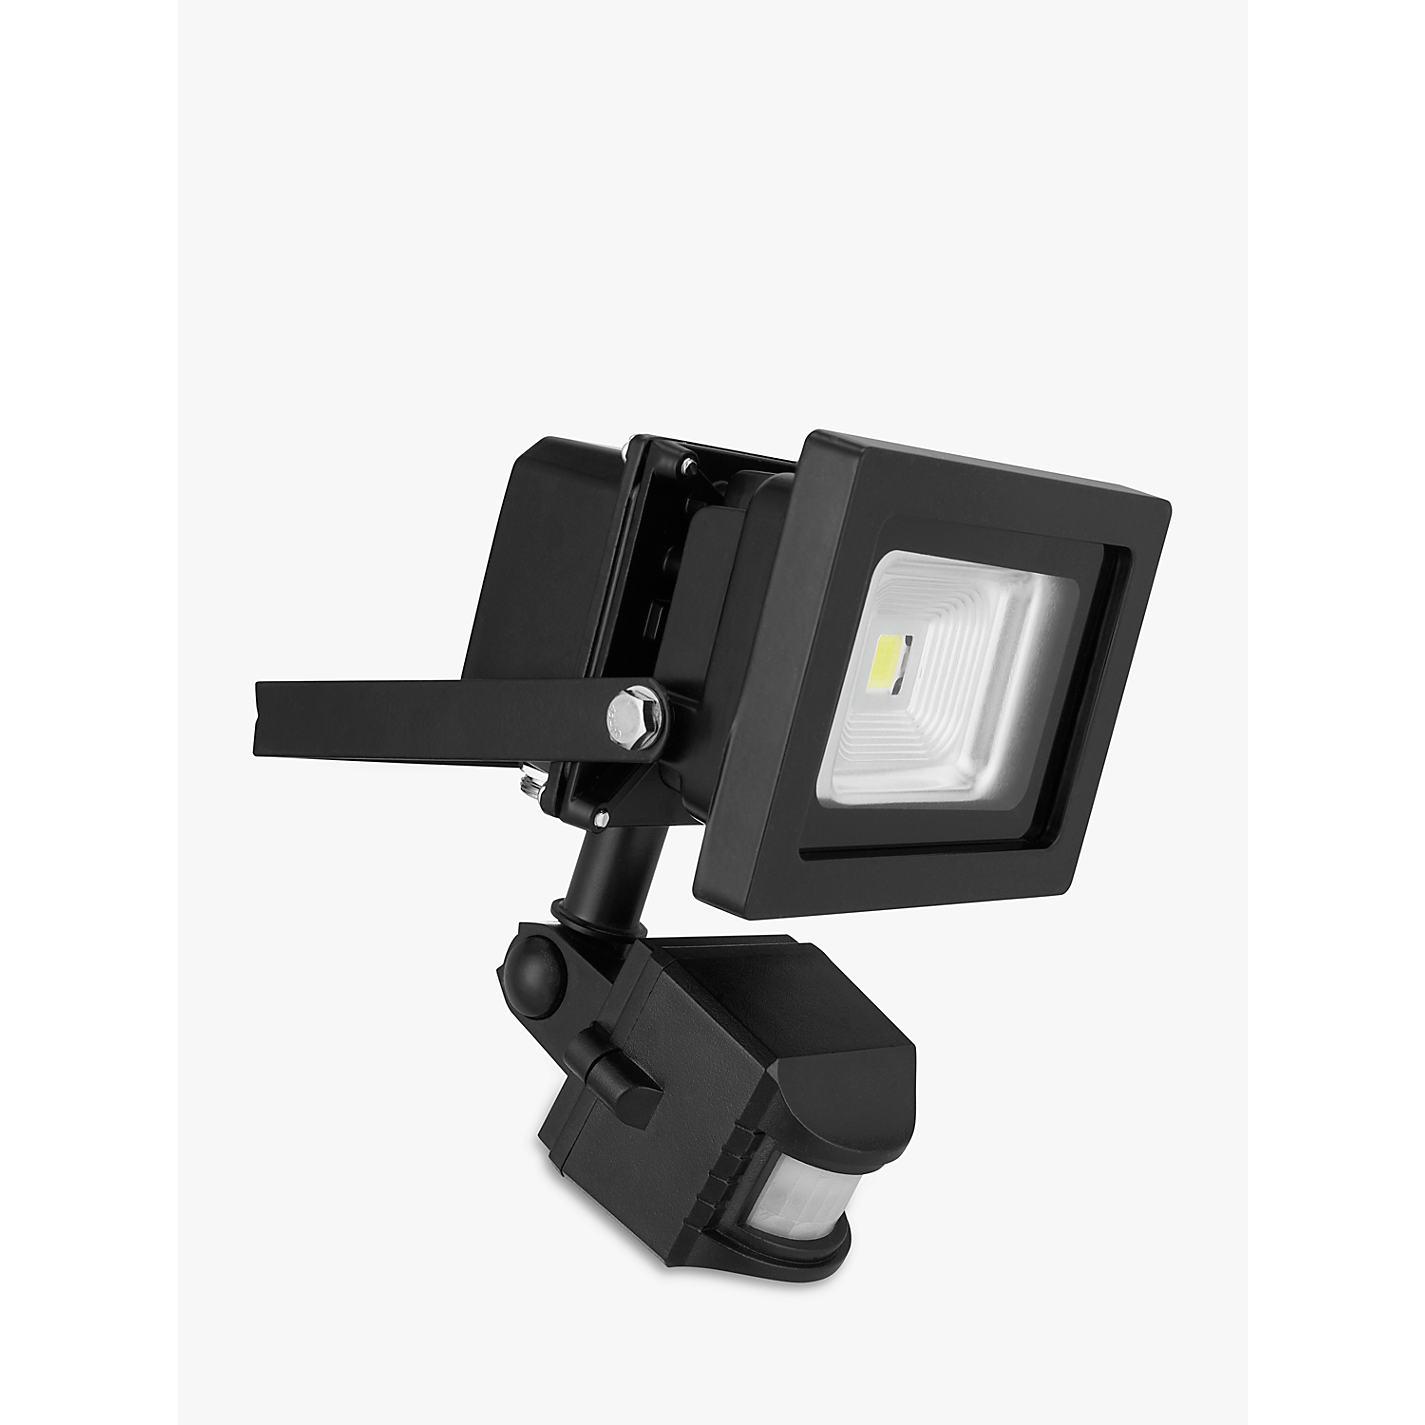 ... Buy John Lewis Seleno PIR Sensor Security LED Outdoor Light Online At  Johnlewis.com ...